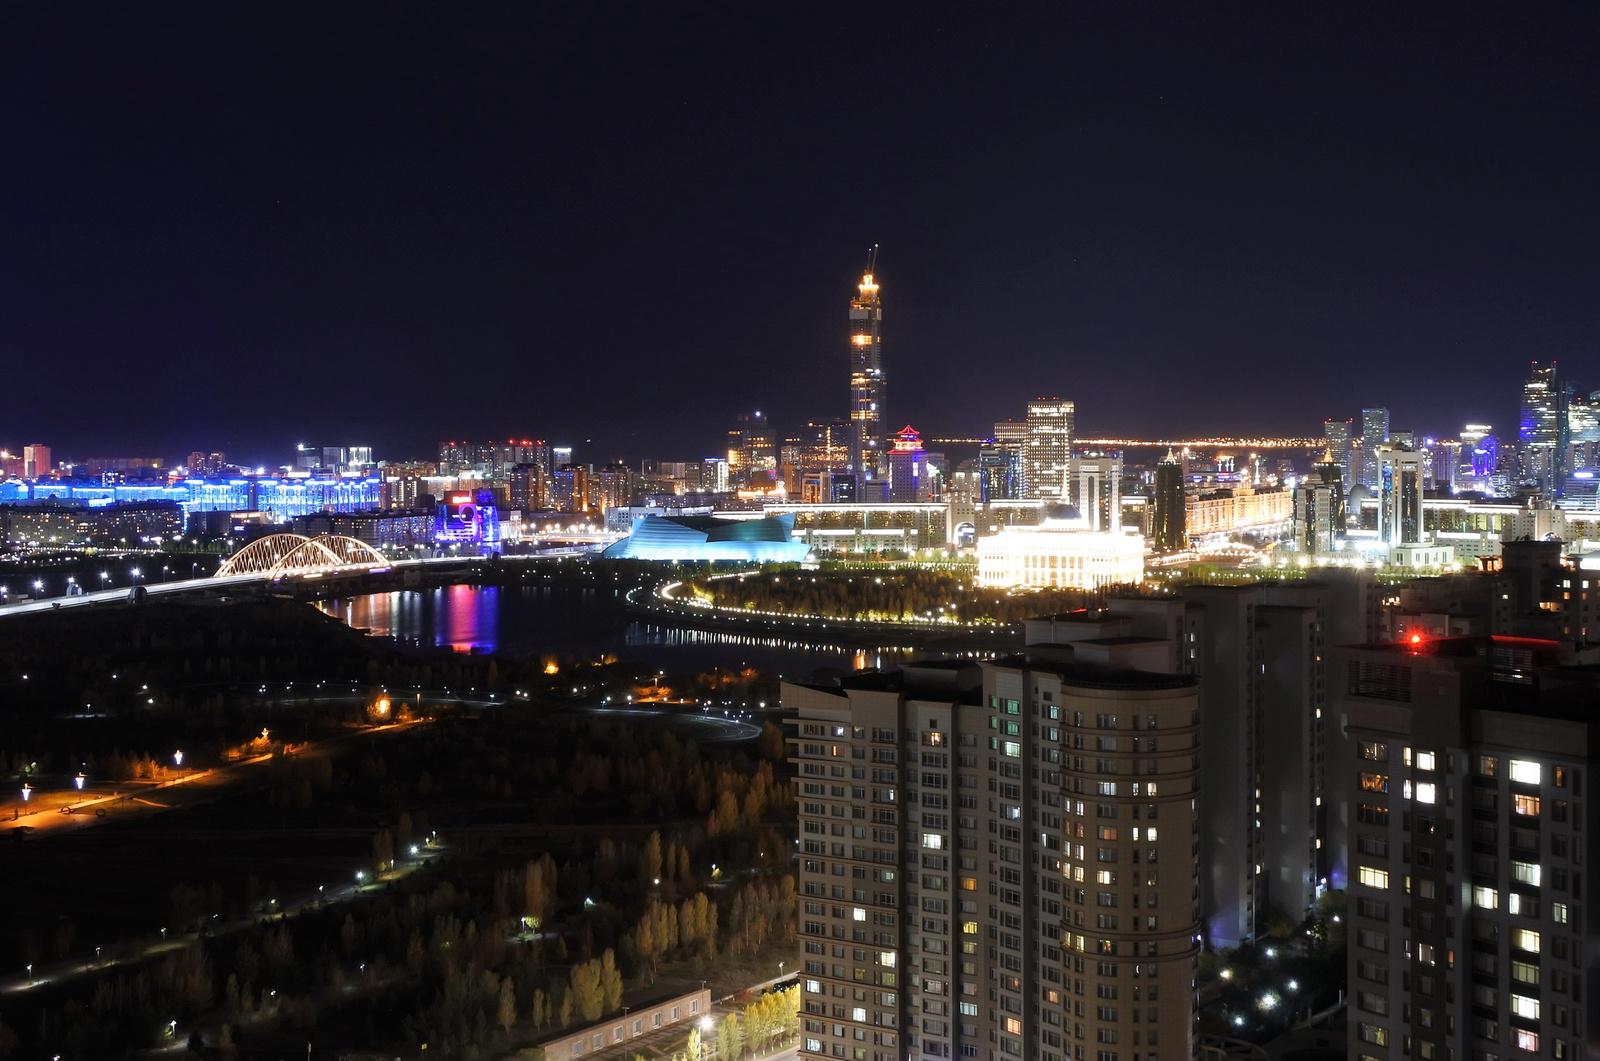 Nursultan/Astana éjjel